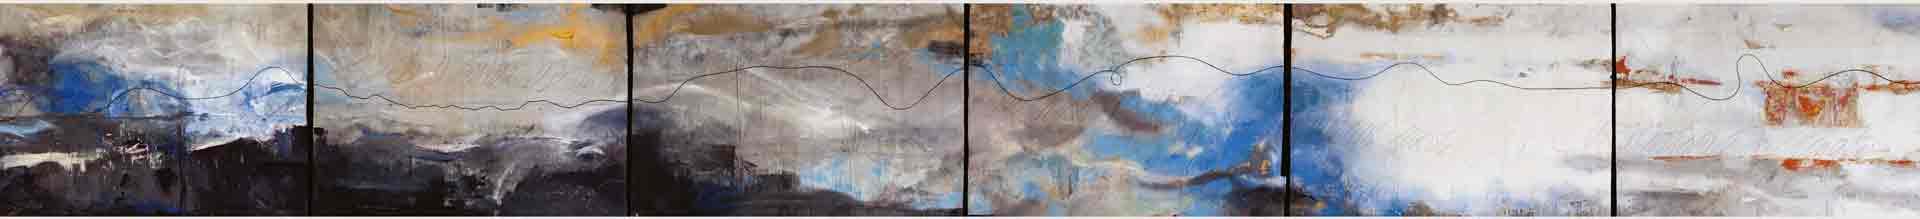 Dalva Duarte 24 Caprices - Abstract strip 06